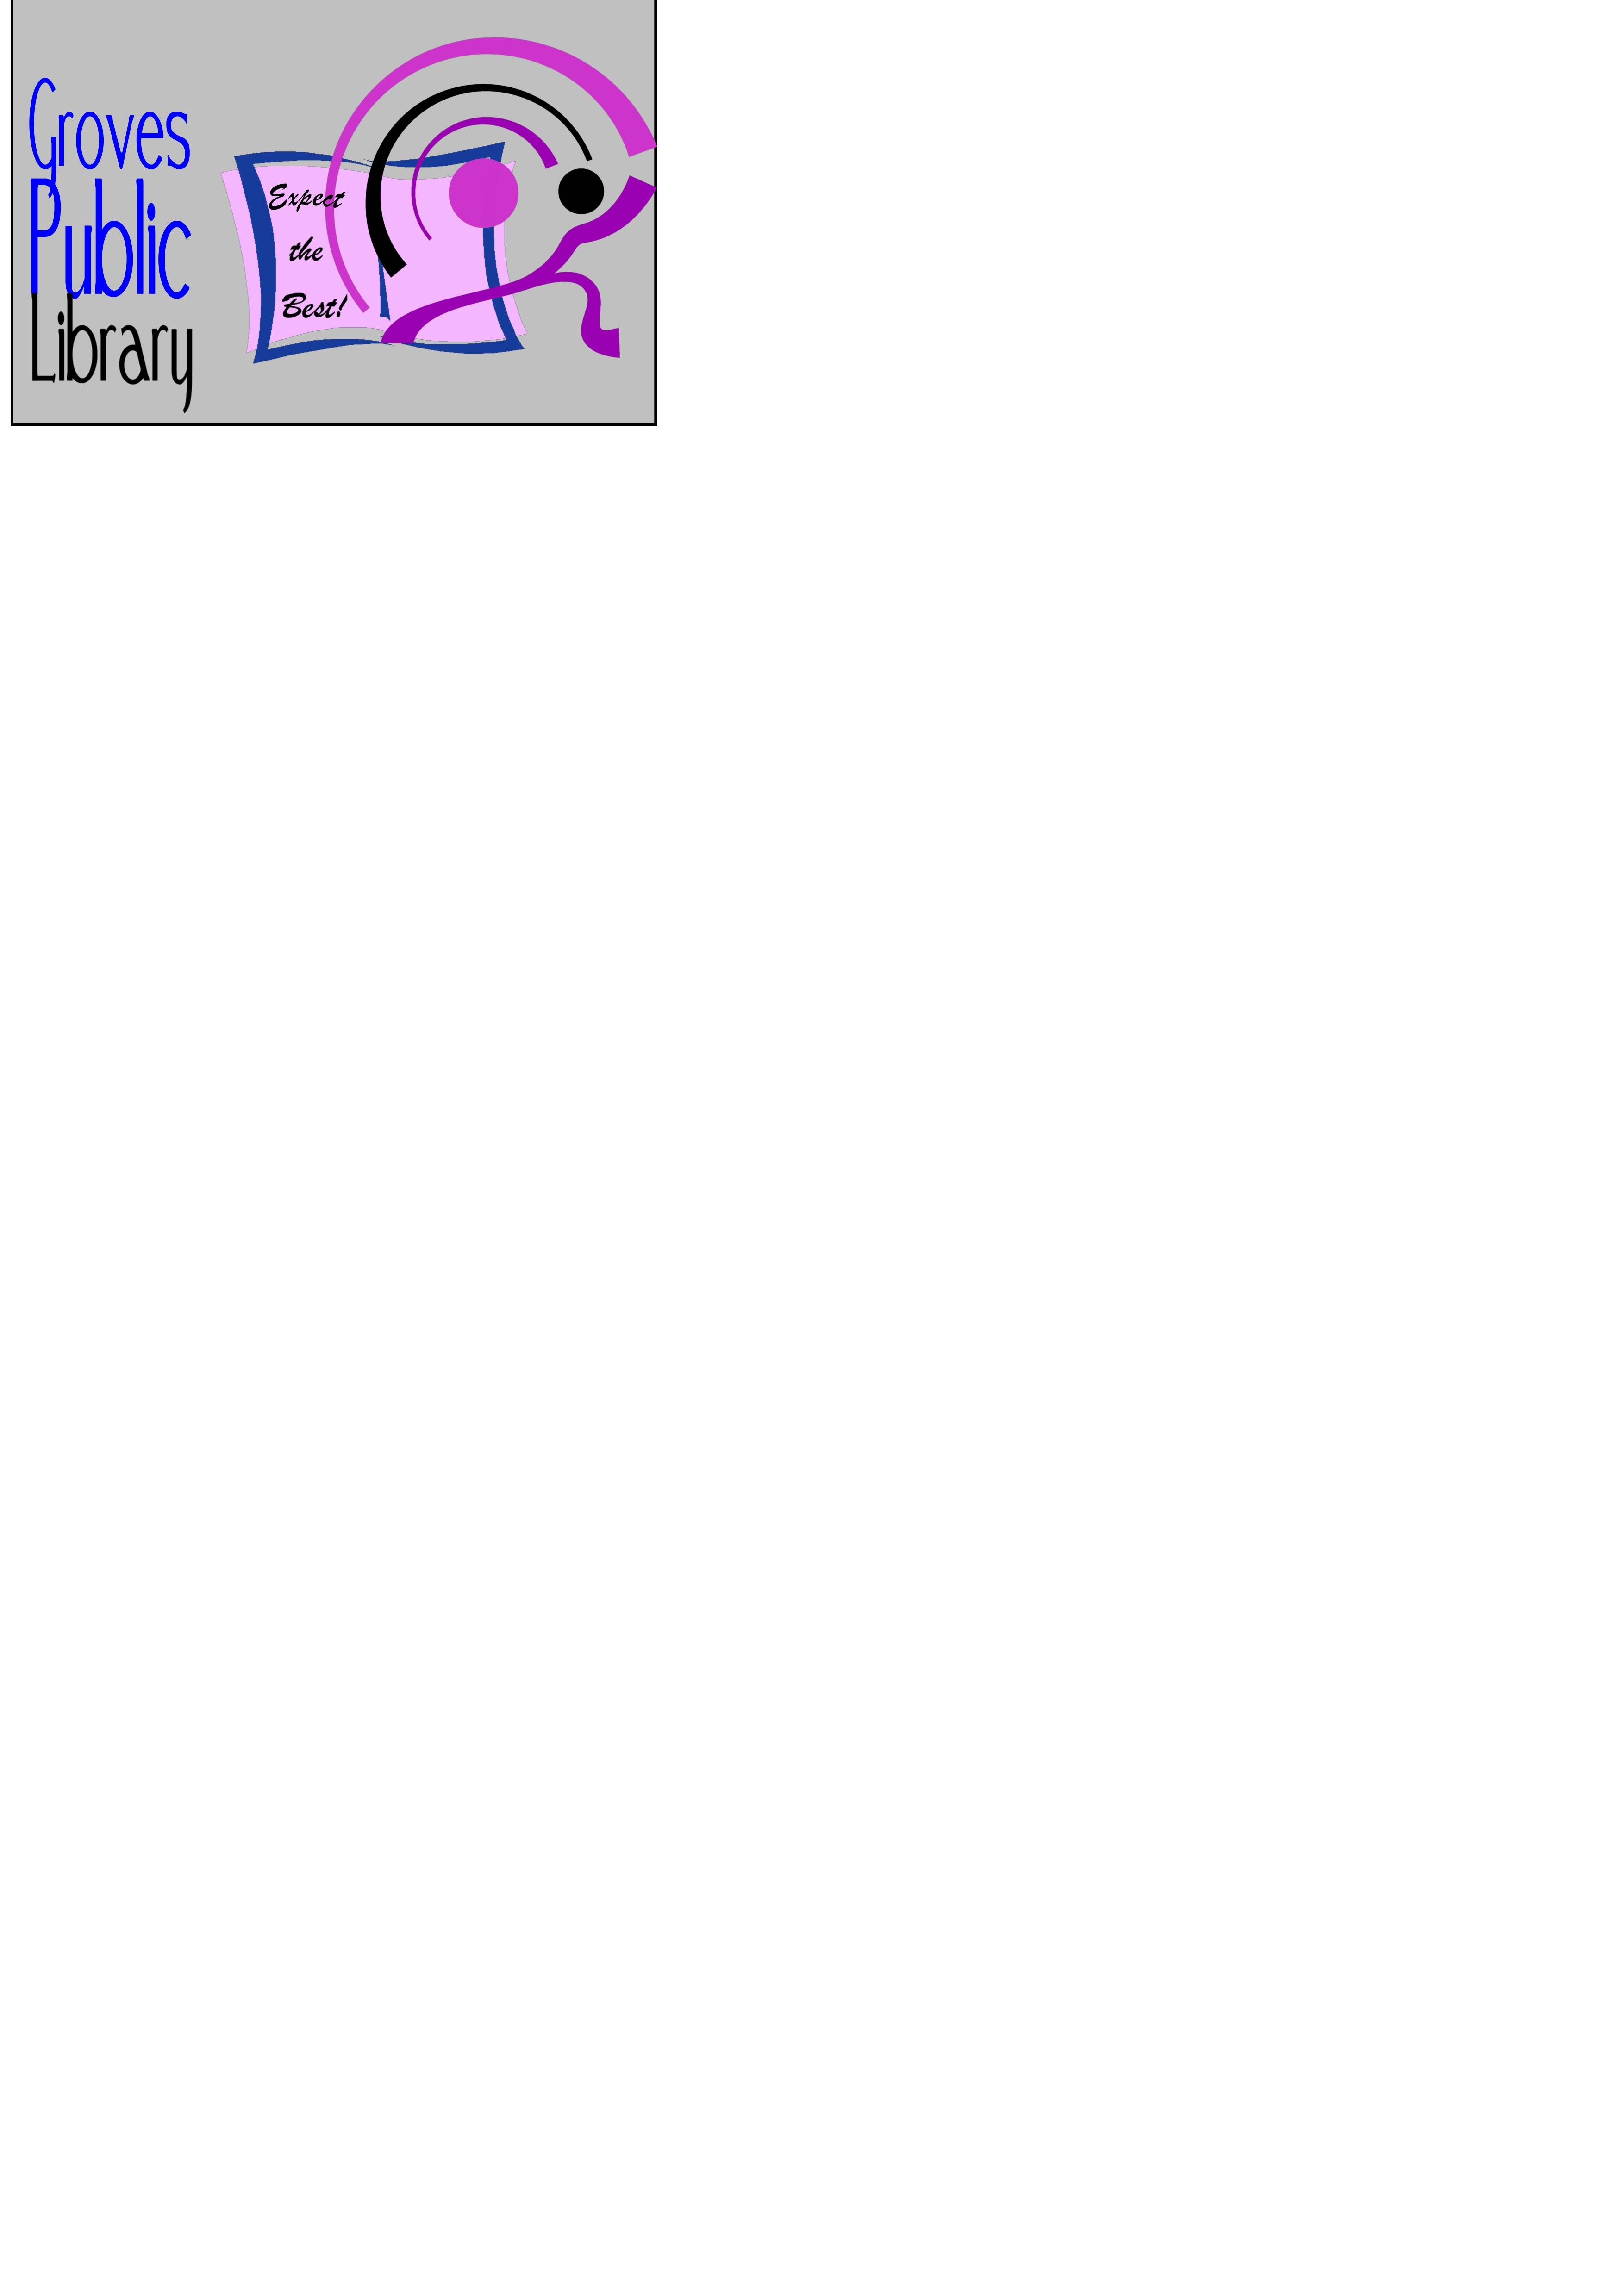 GPL logo test feb 9 2010